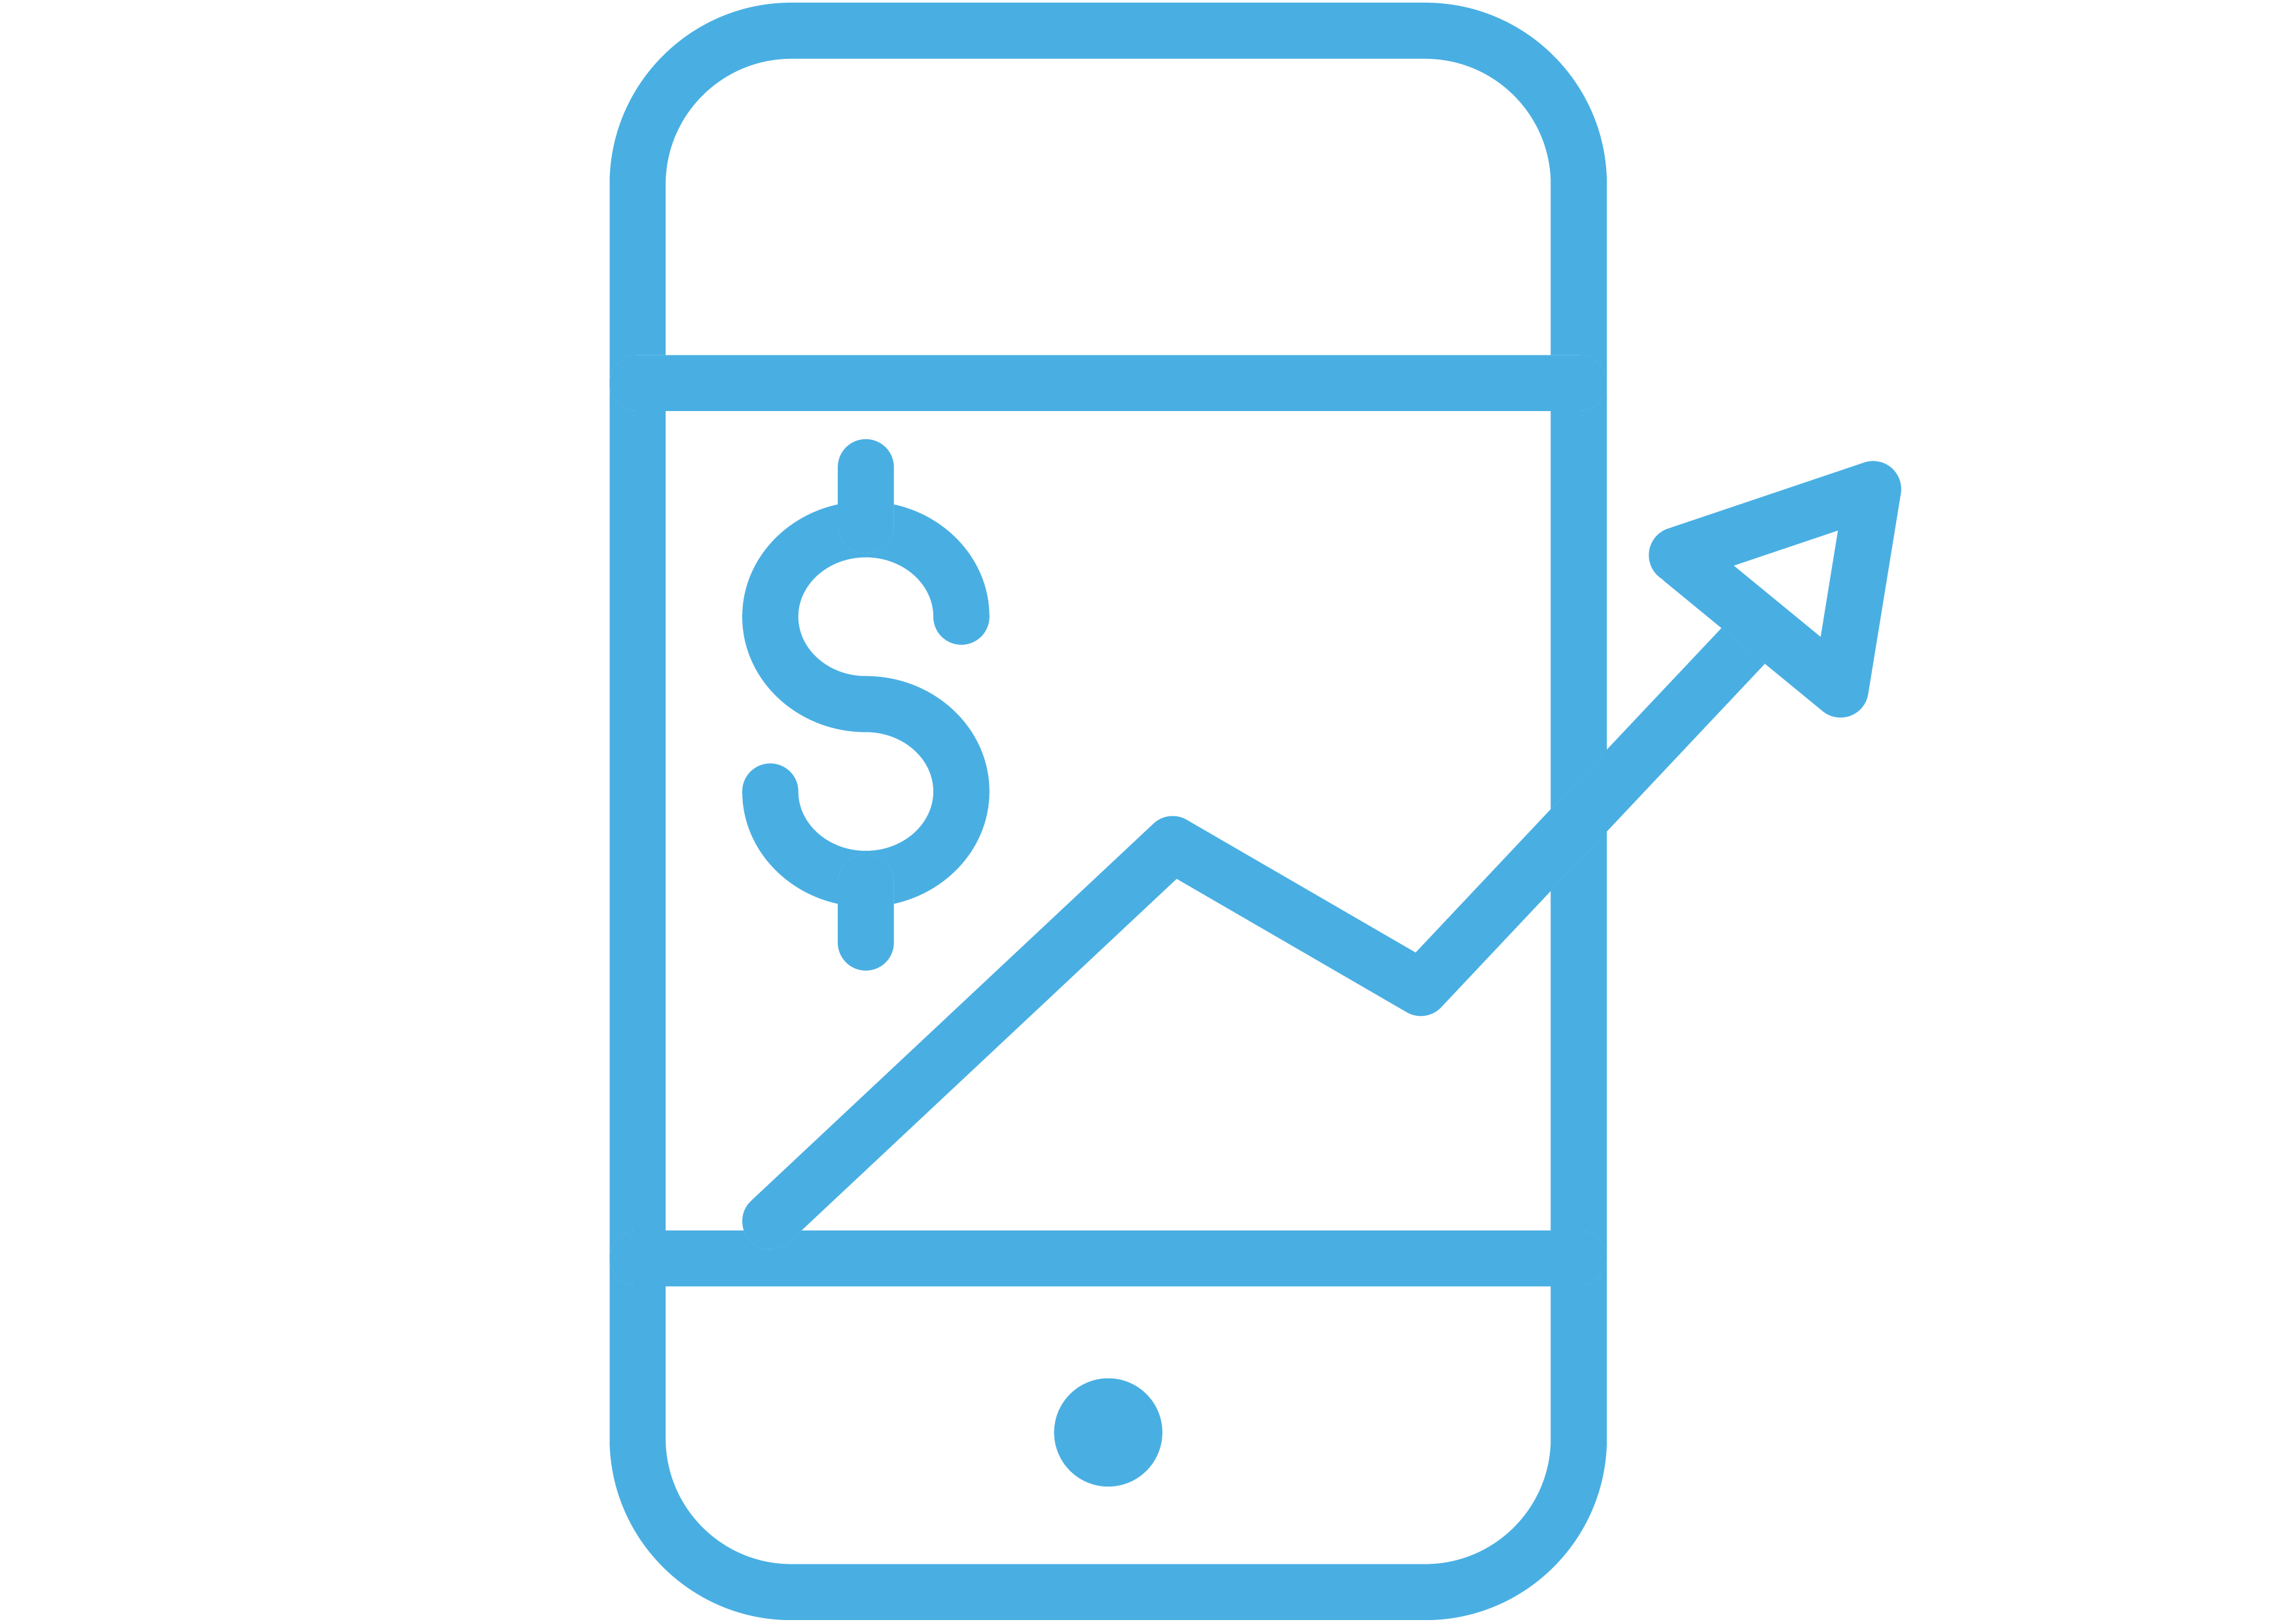 phone icon image